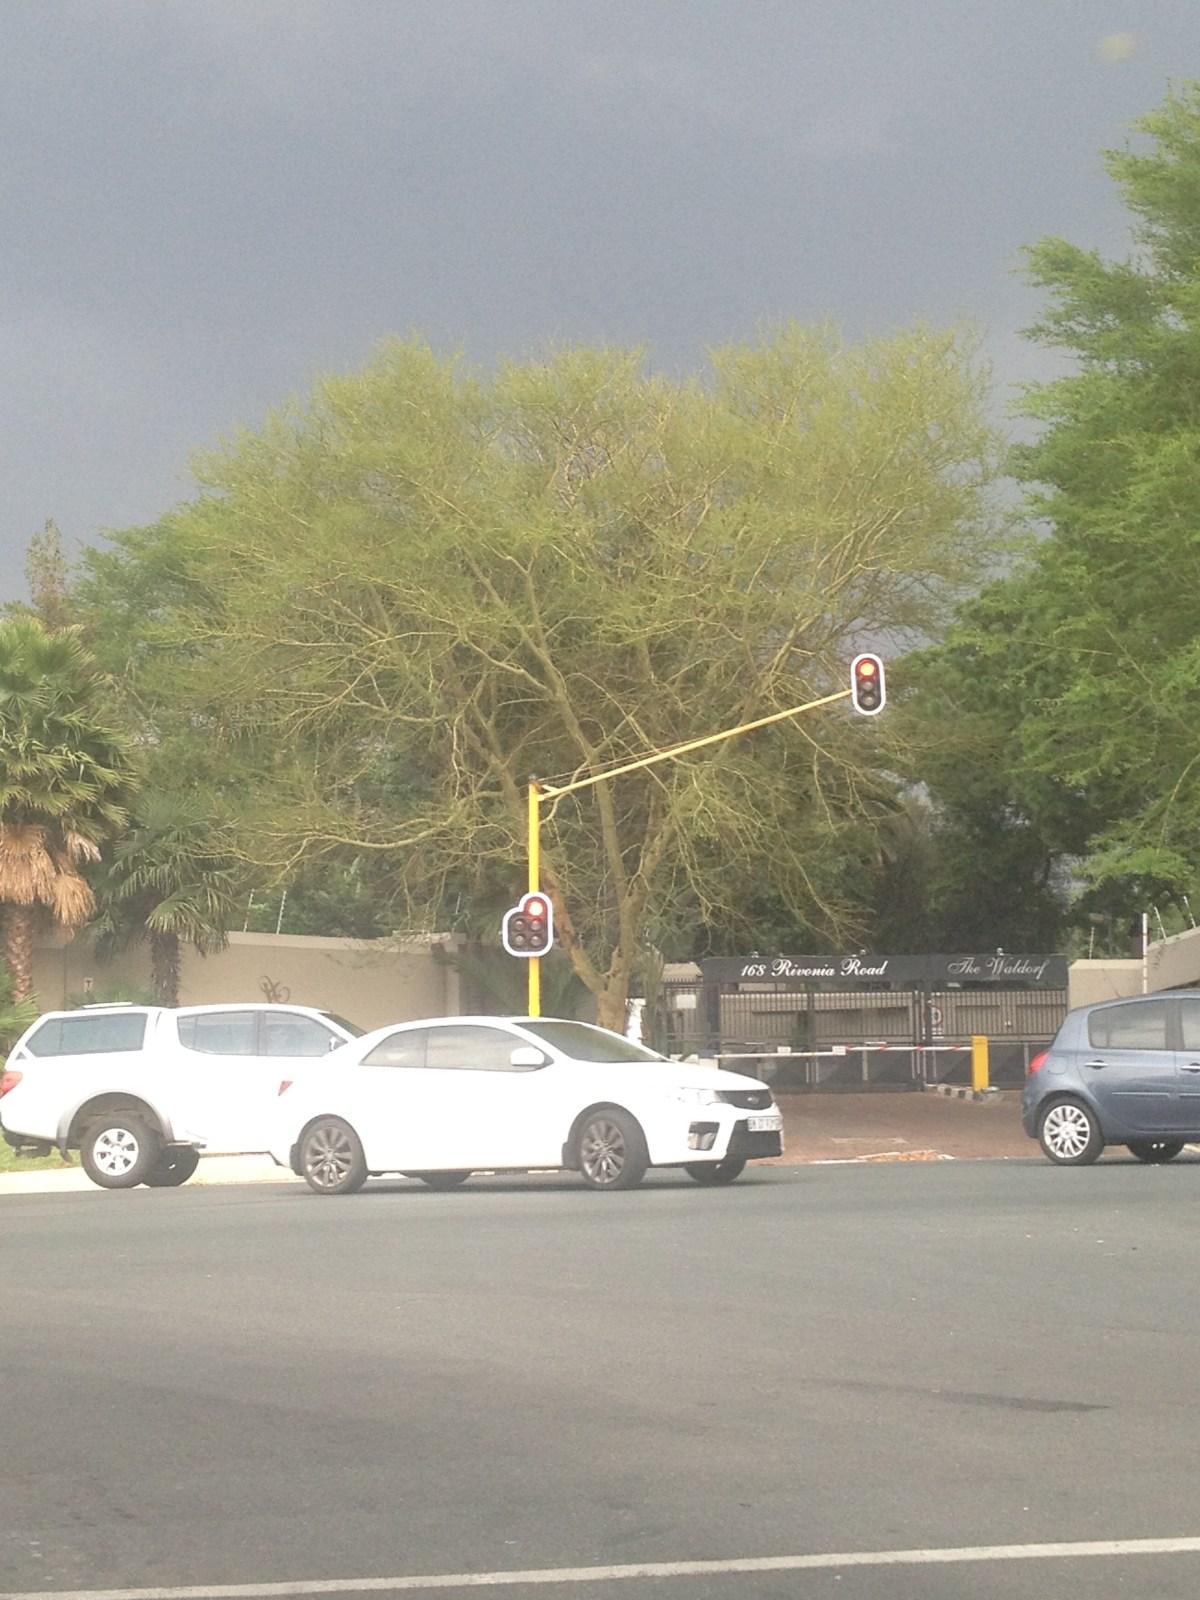 Johannesburg Tourism: Thunderstorm in Johannesburg South Africa Part II